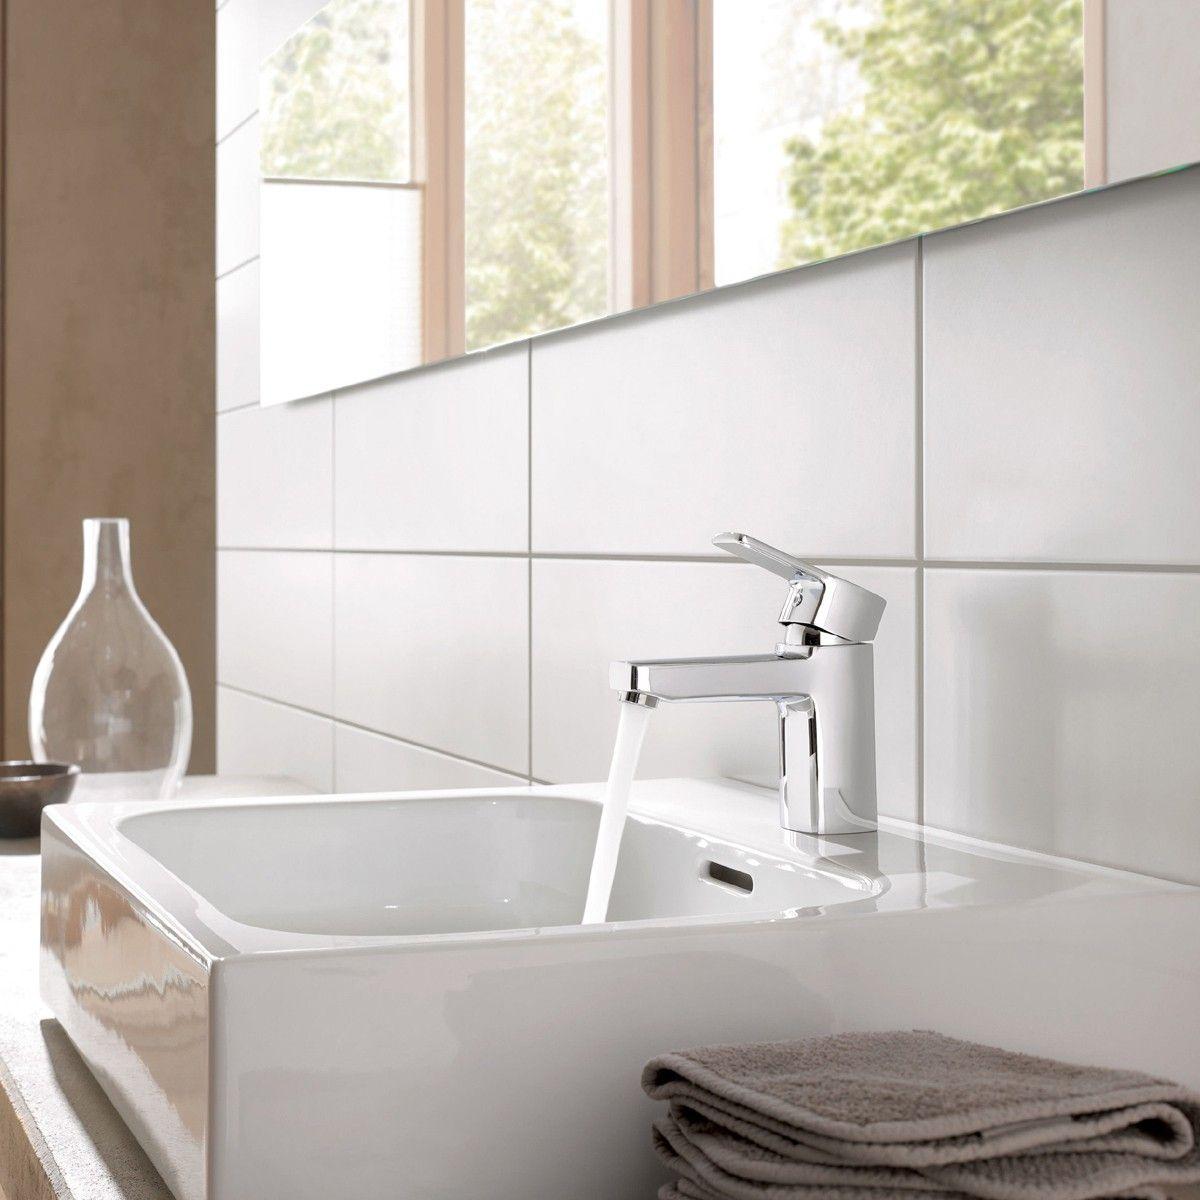 Flat Matt White Ceramic Wall Tiles White Bathroom Tiles Tile Bathroom Bathroom Wall Tile